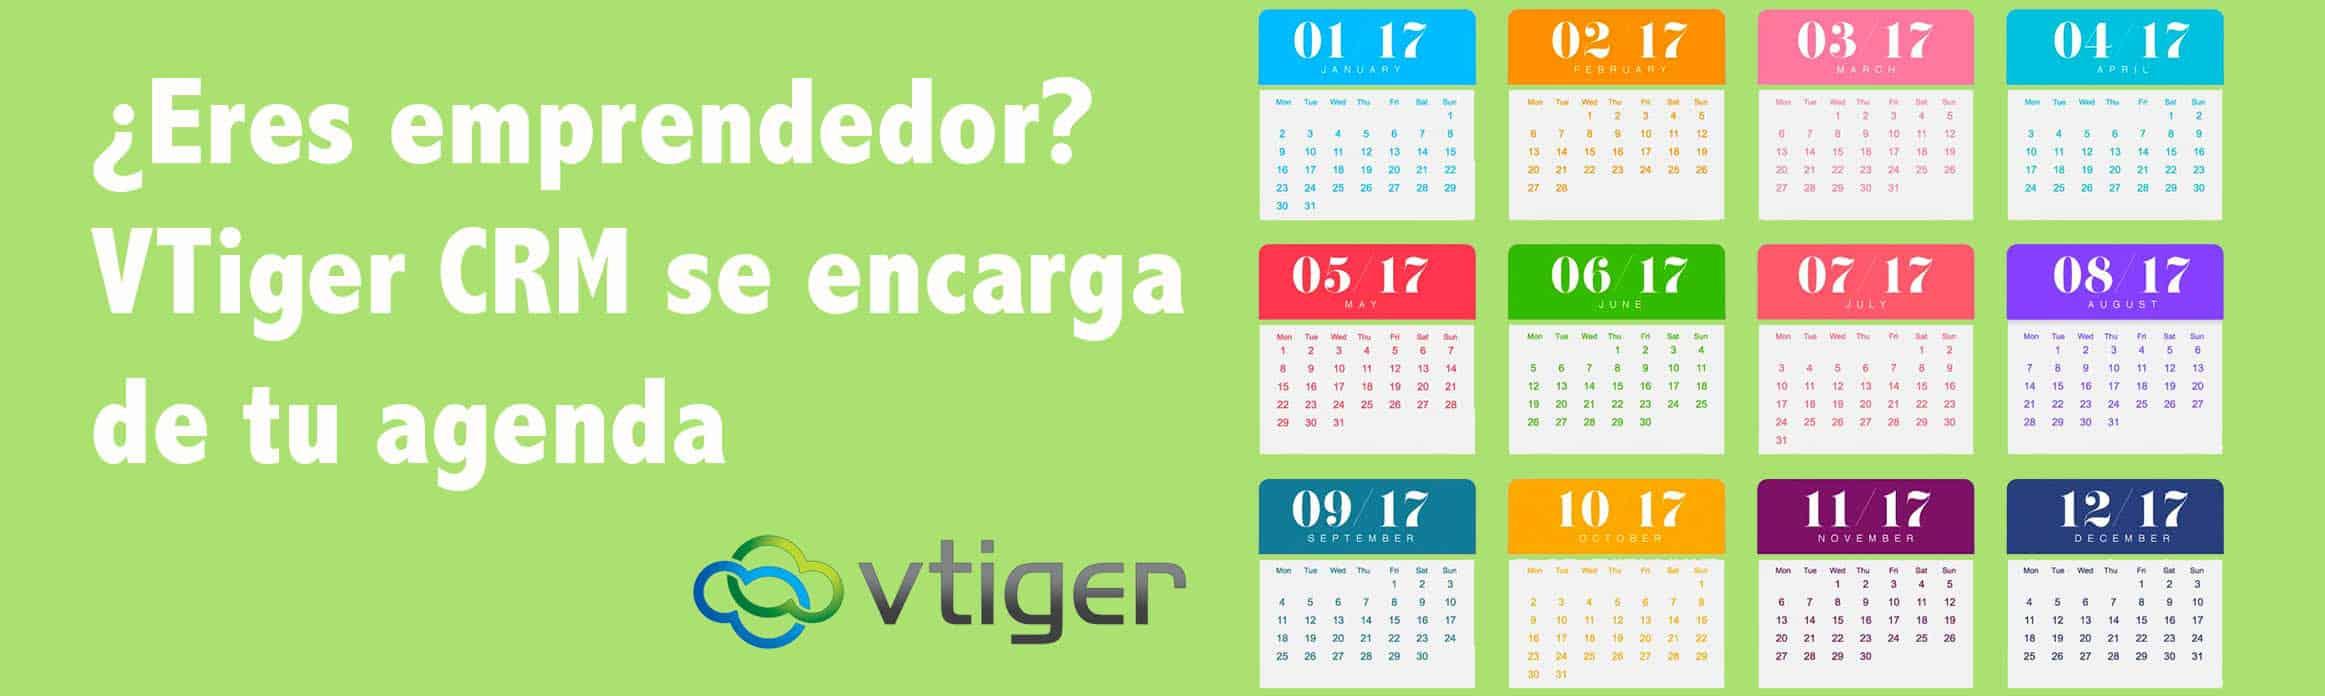 VTIGER, CRM VISUAL